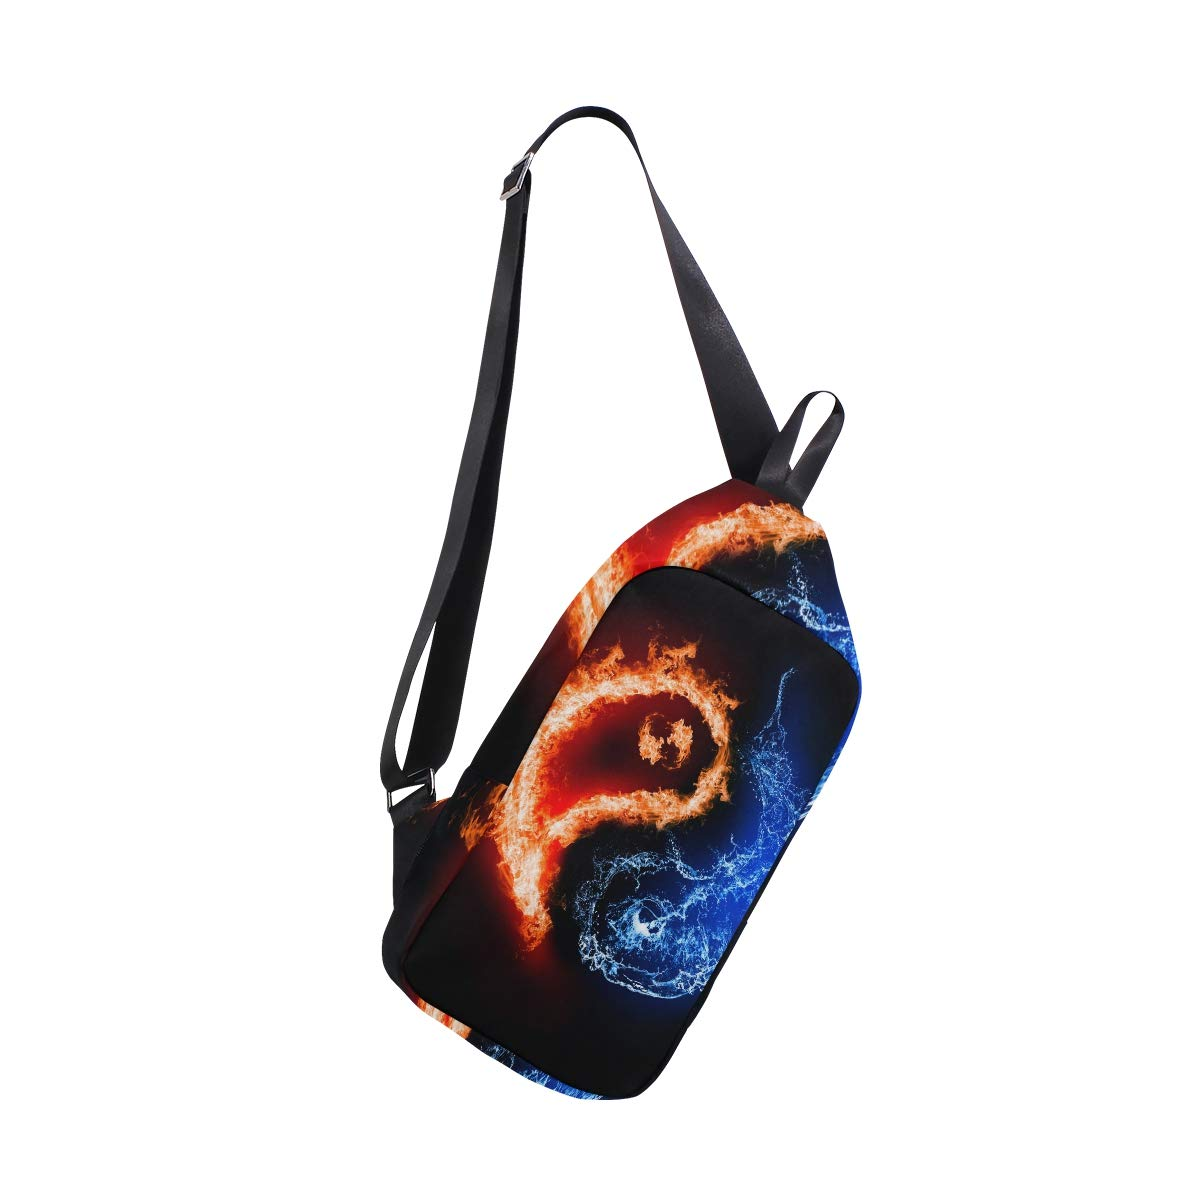 AHOMY Fire /& Ice Taiji Messenger Bag Small Travel School Sling Bag Crossbody Bag